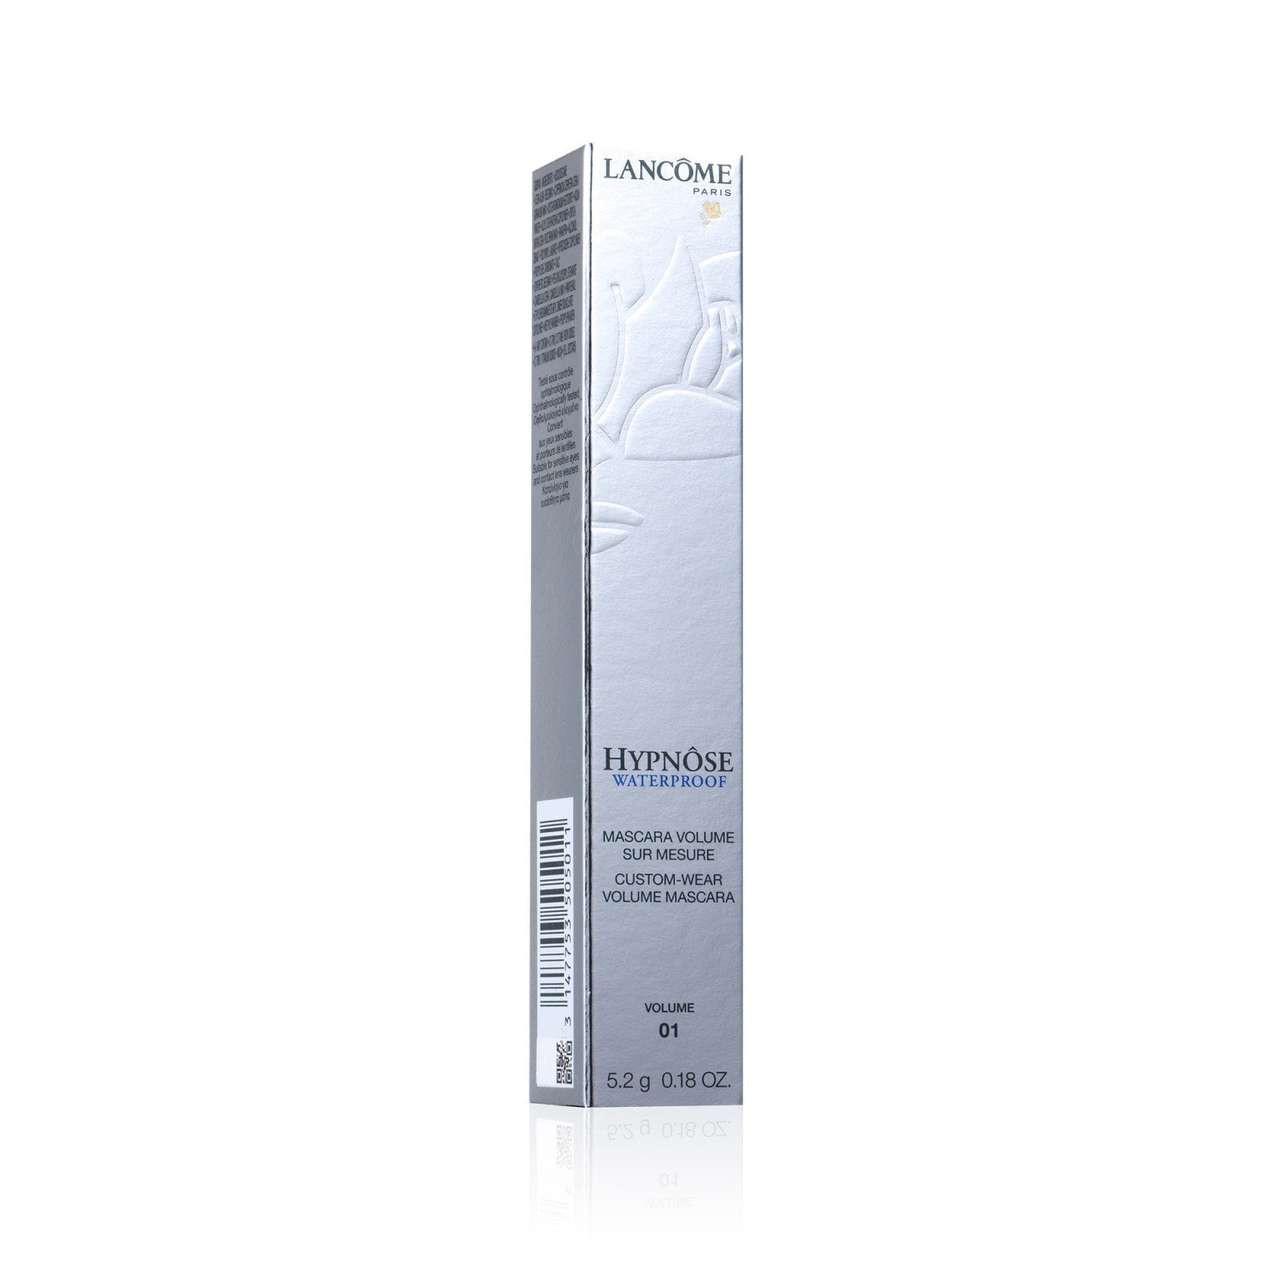 ff7c6f6353f Lancome. Hypnose Waterproof Custom-Wear Volume Mascara 5.2g / 0.18oz #01 ...